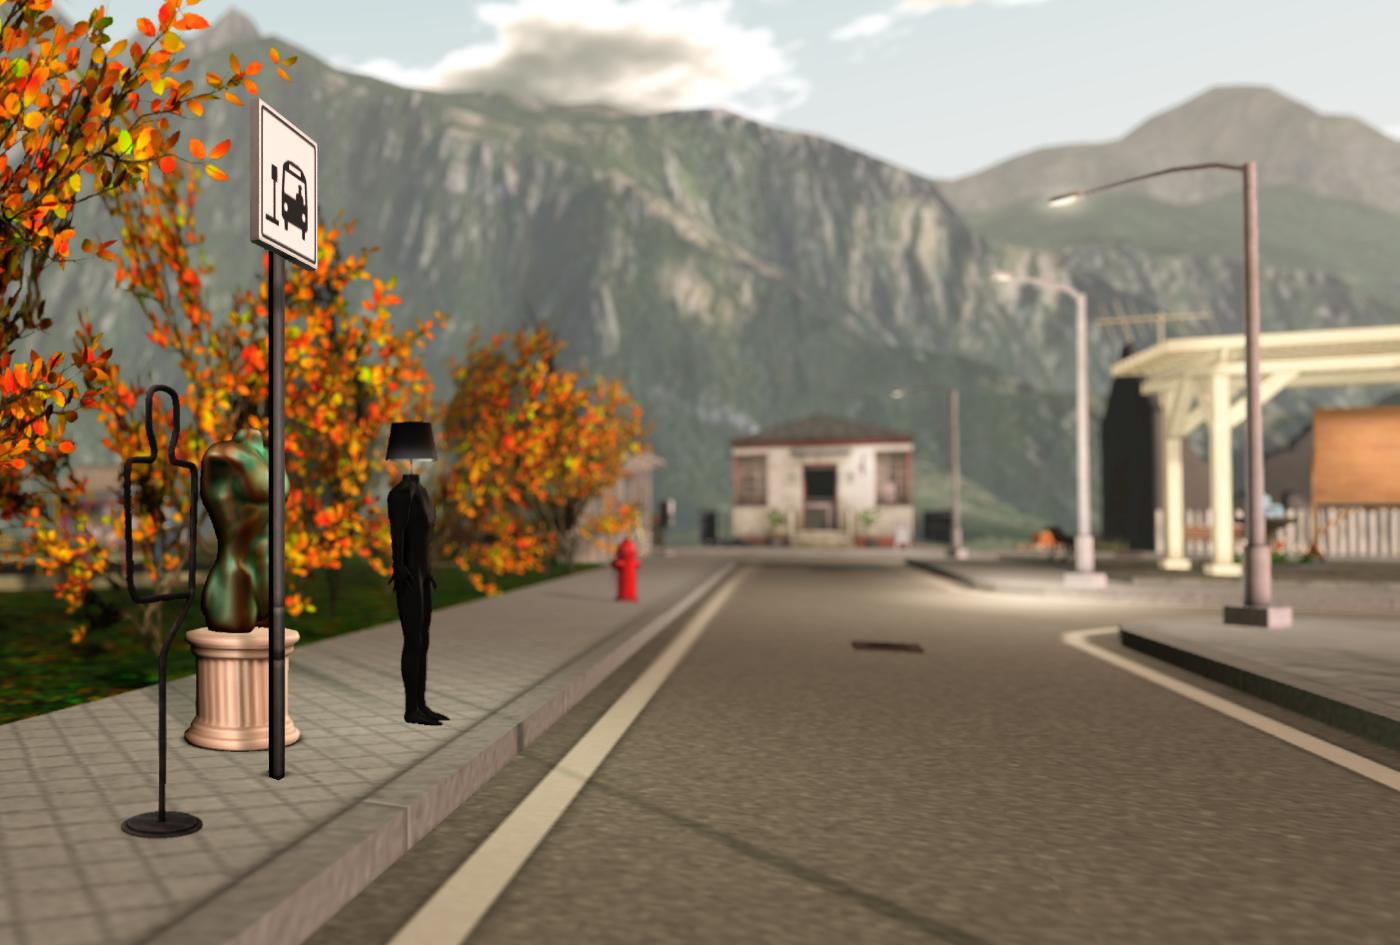 The town of Brazen Fair Ends: weird buddies waiting for the bus